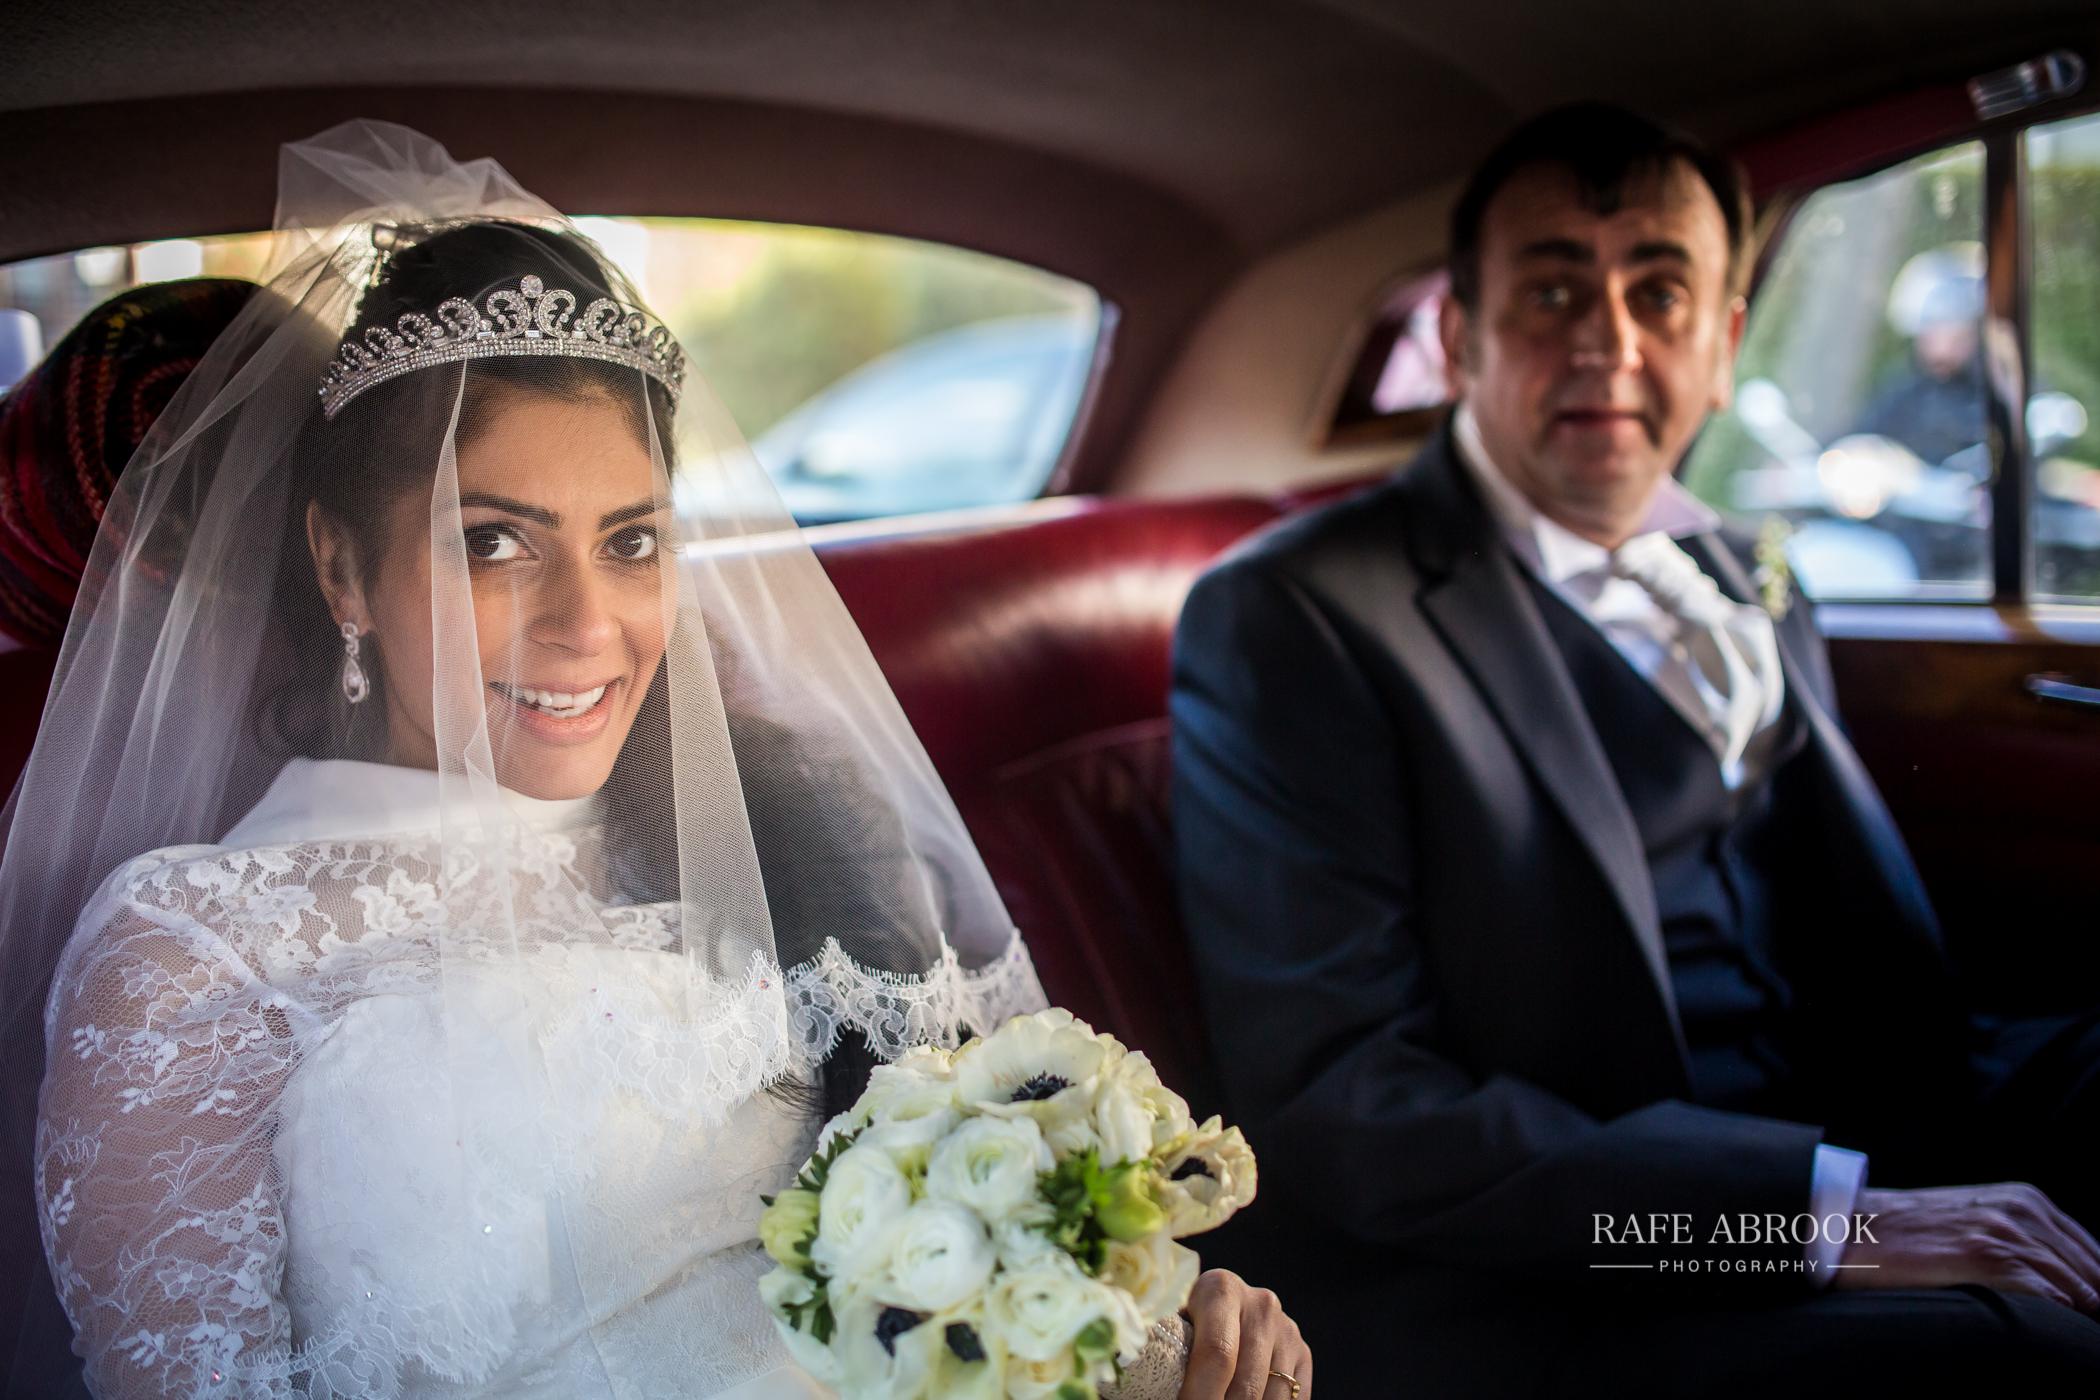 roma & pete wedding hampstead shenley hertfordshire -126.jpg